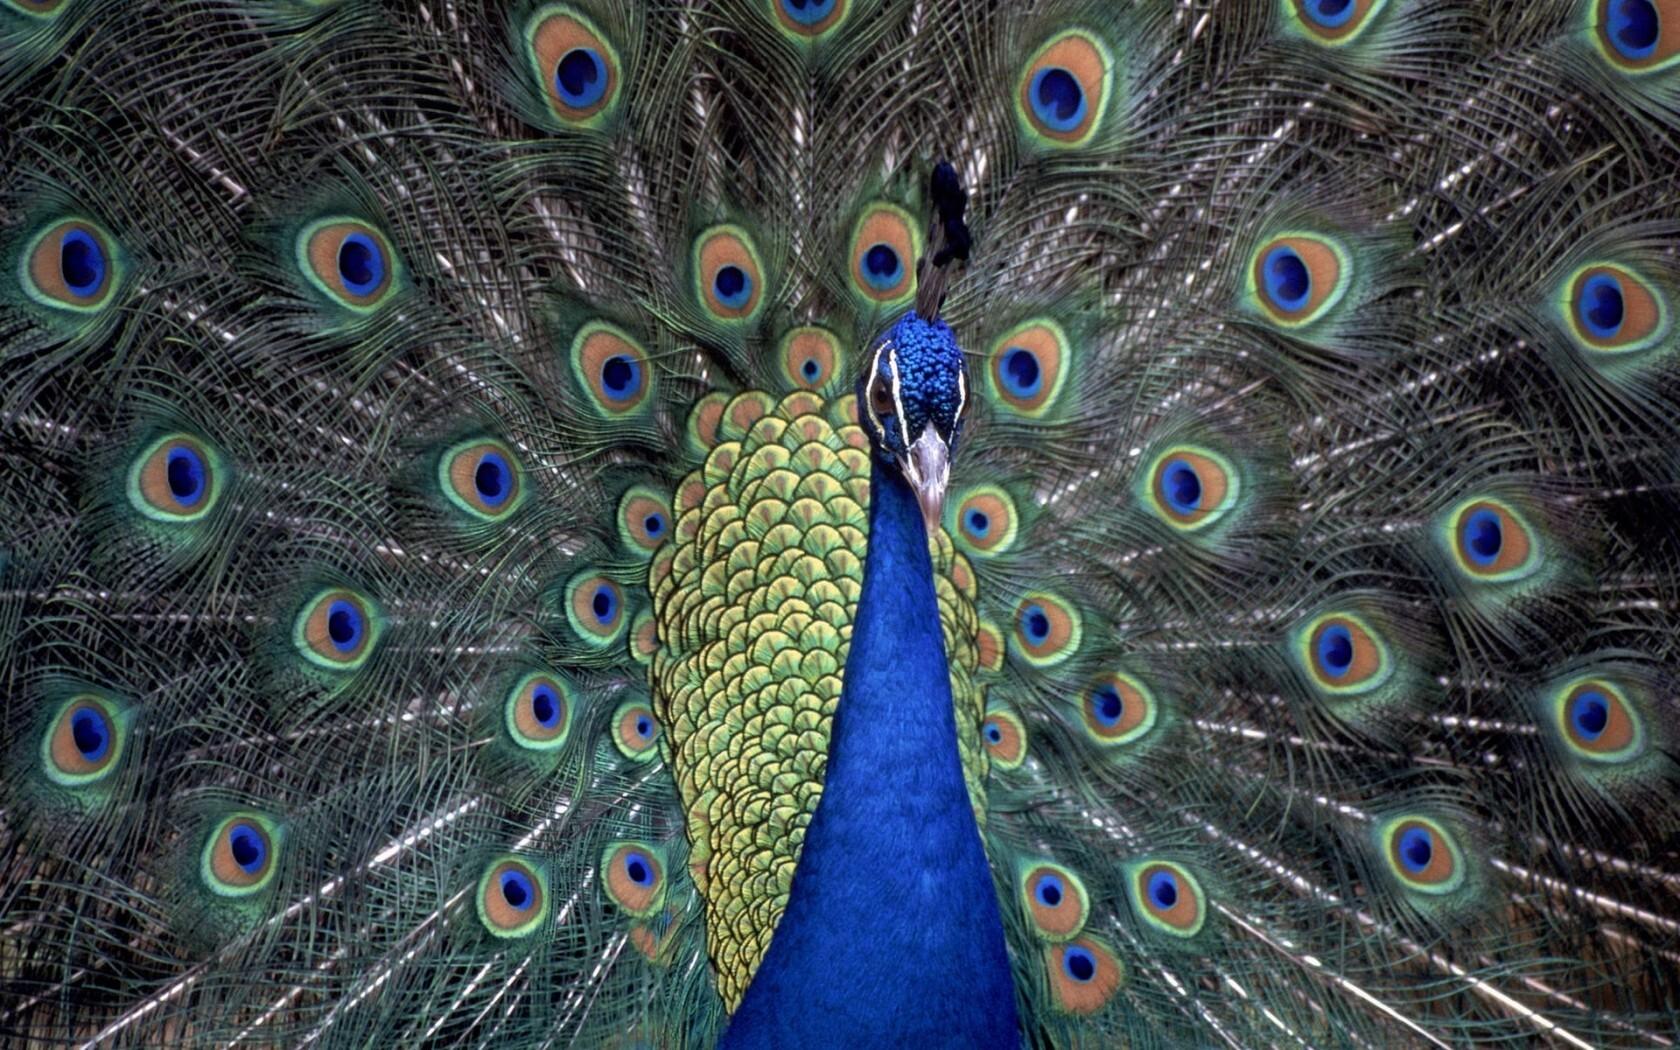 peacocks-hd.jpg